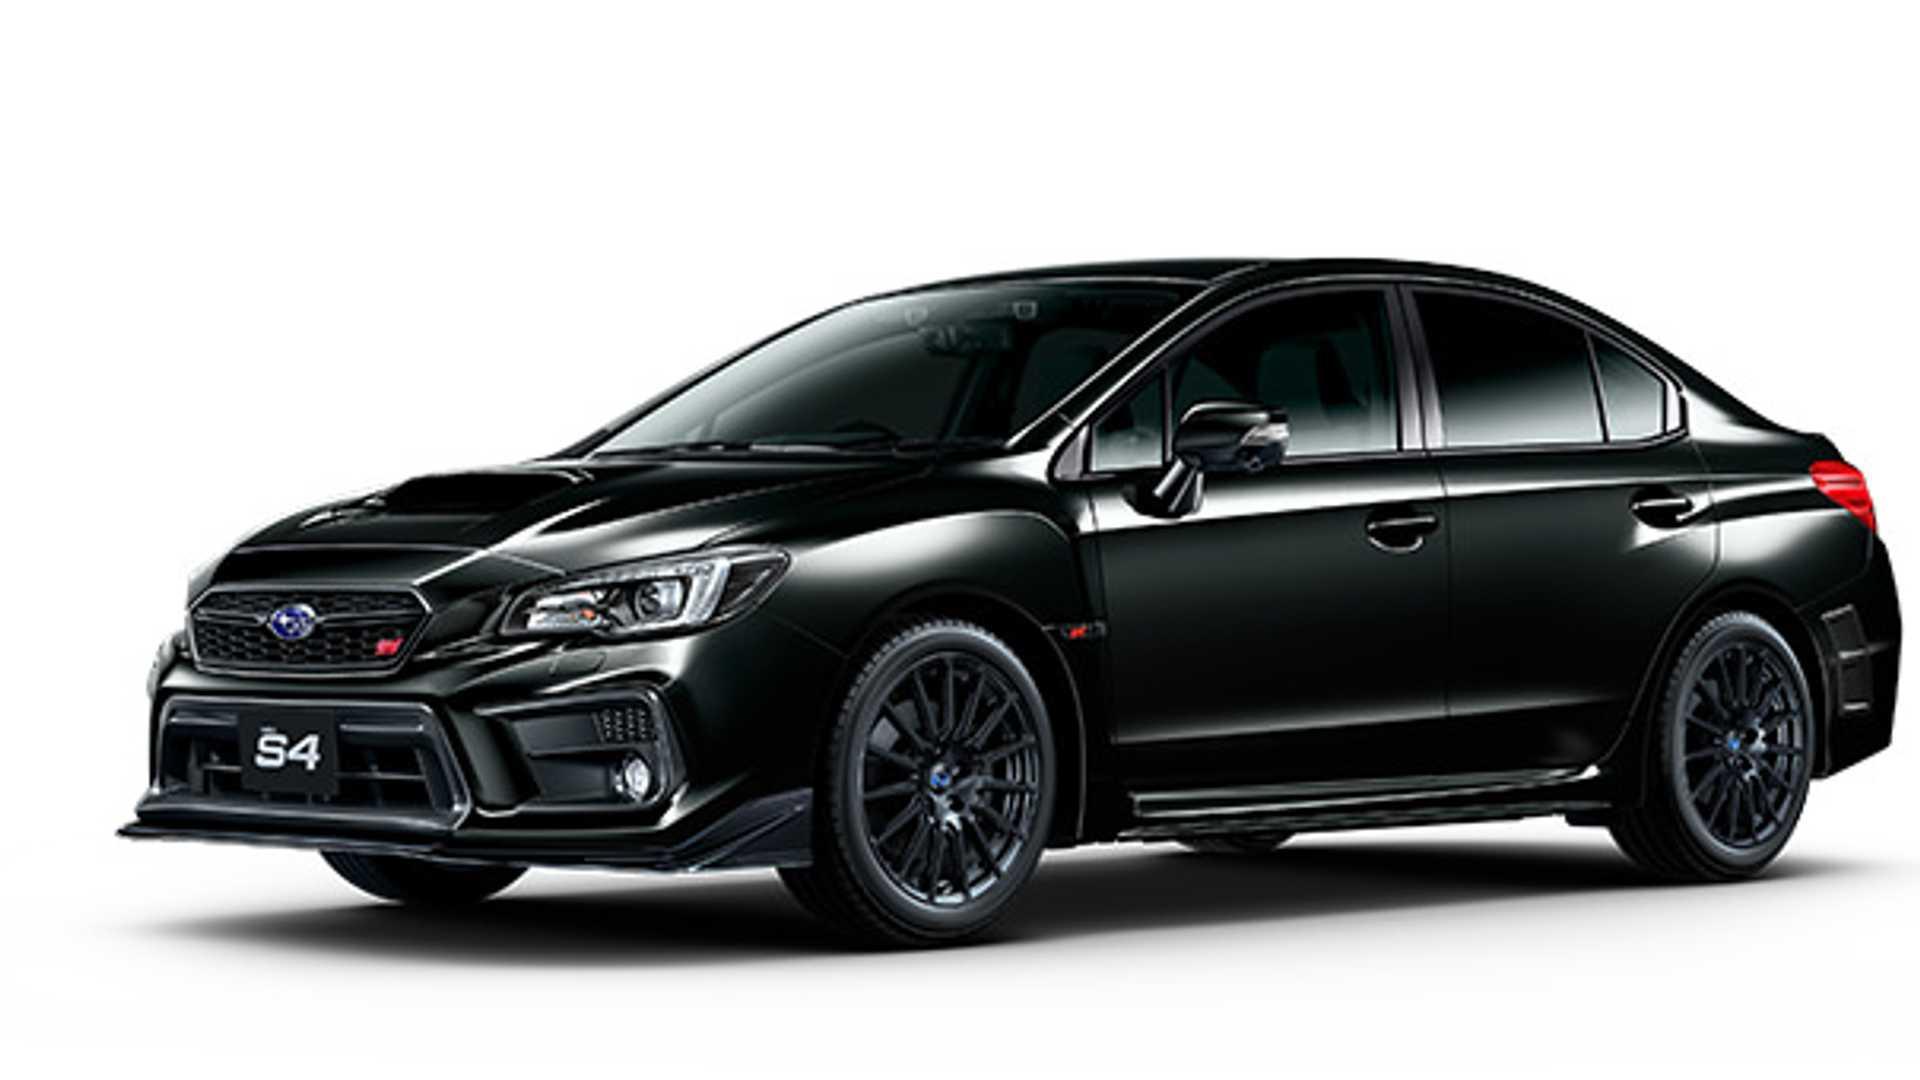 Subaru-WRX-S4-STI-Sport-Sharp-3